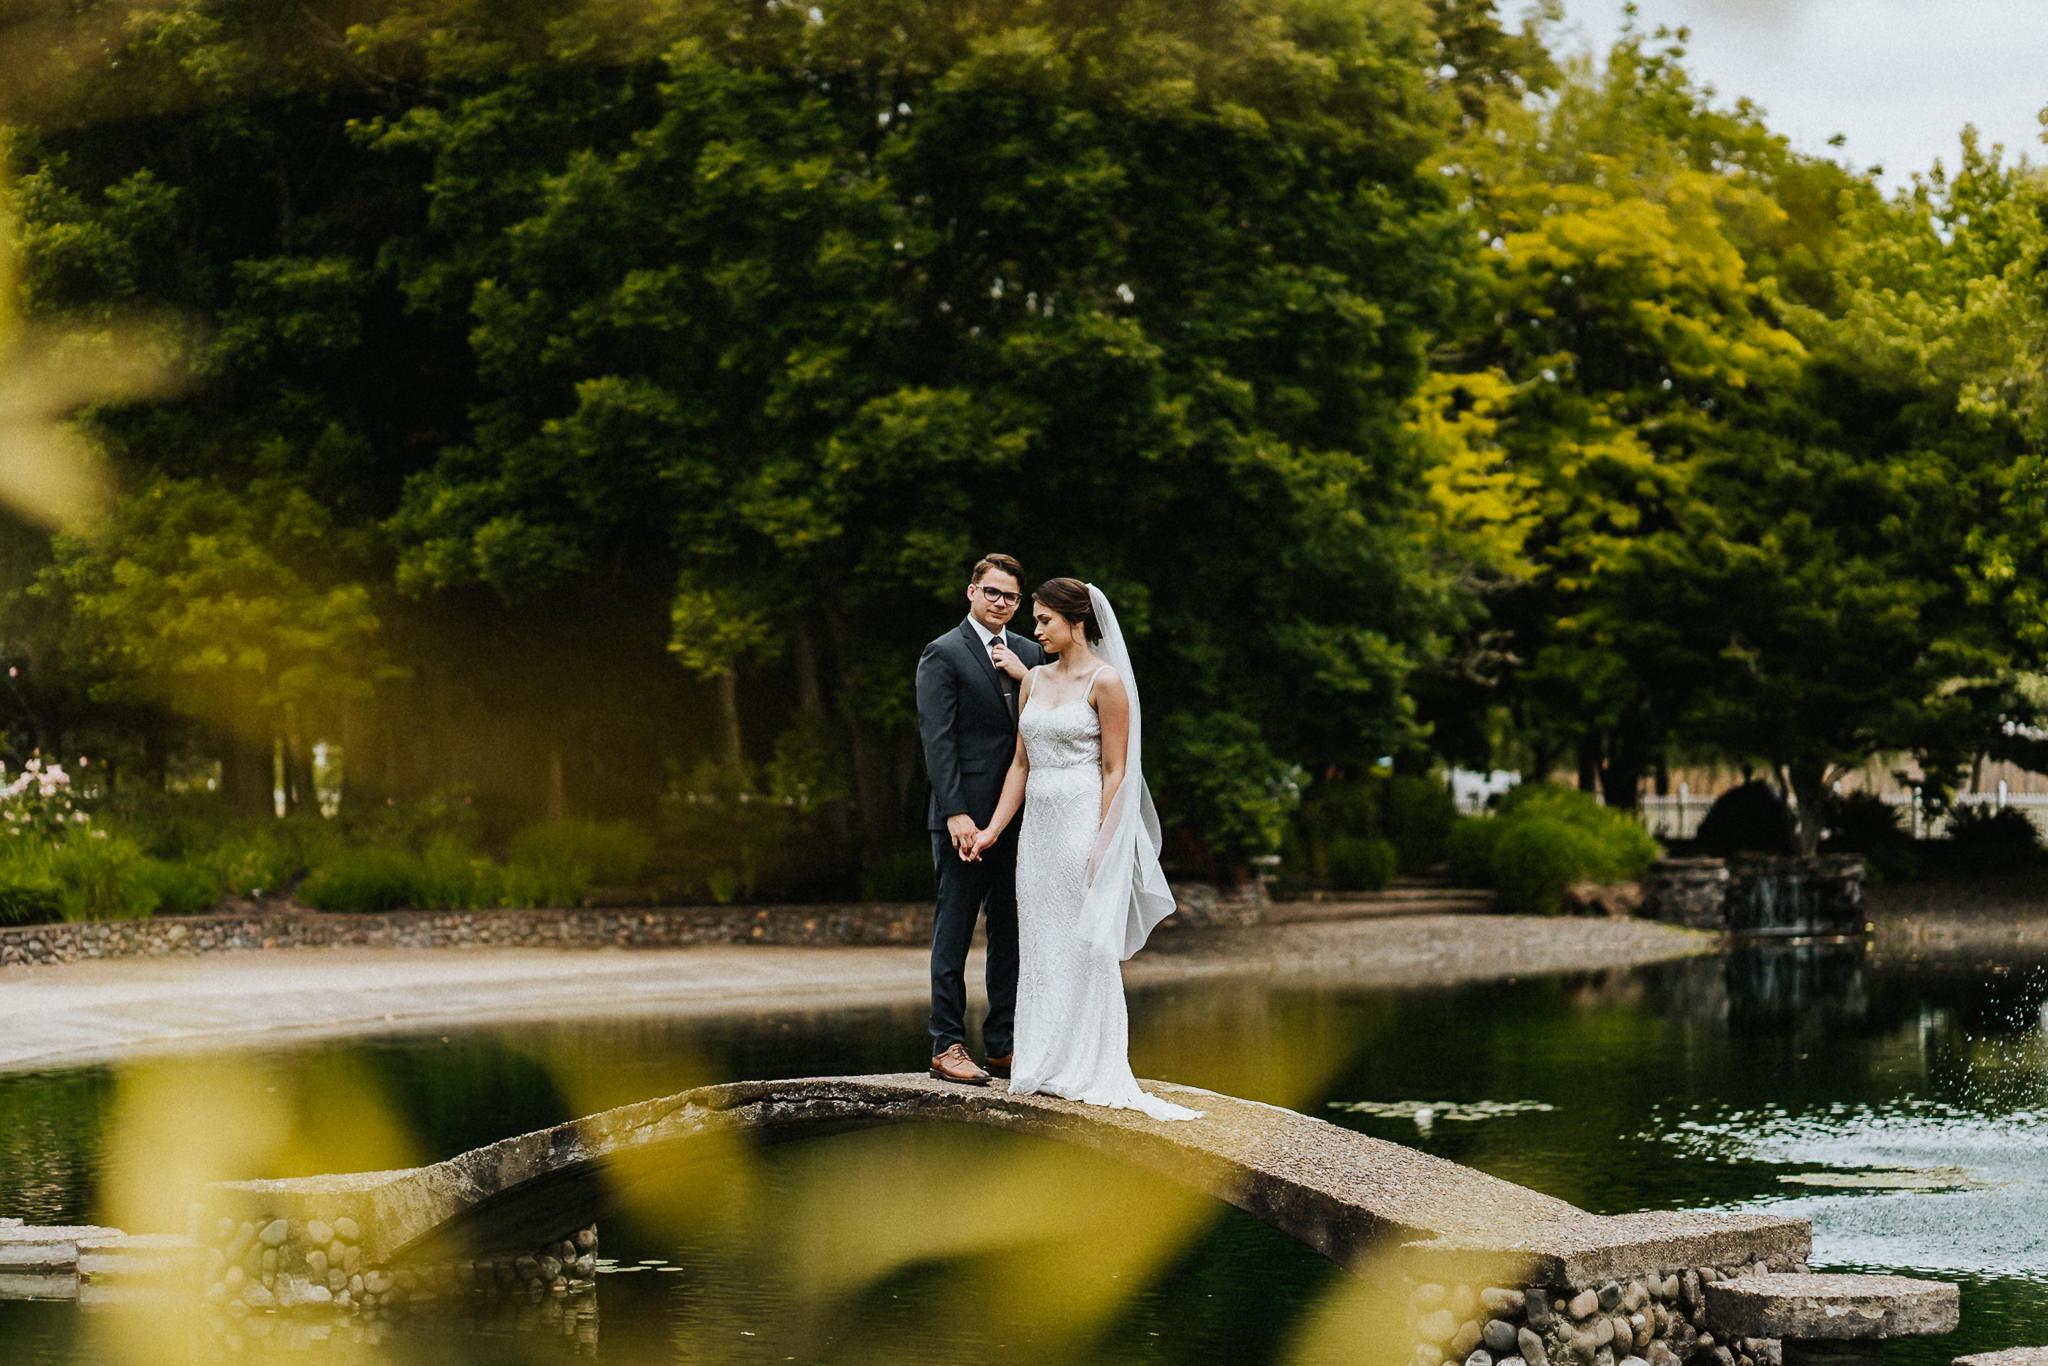 Dark Moody Wedding Portrait Bride Groom Bridge Water Stoic